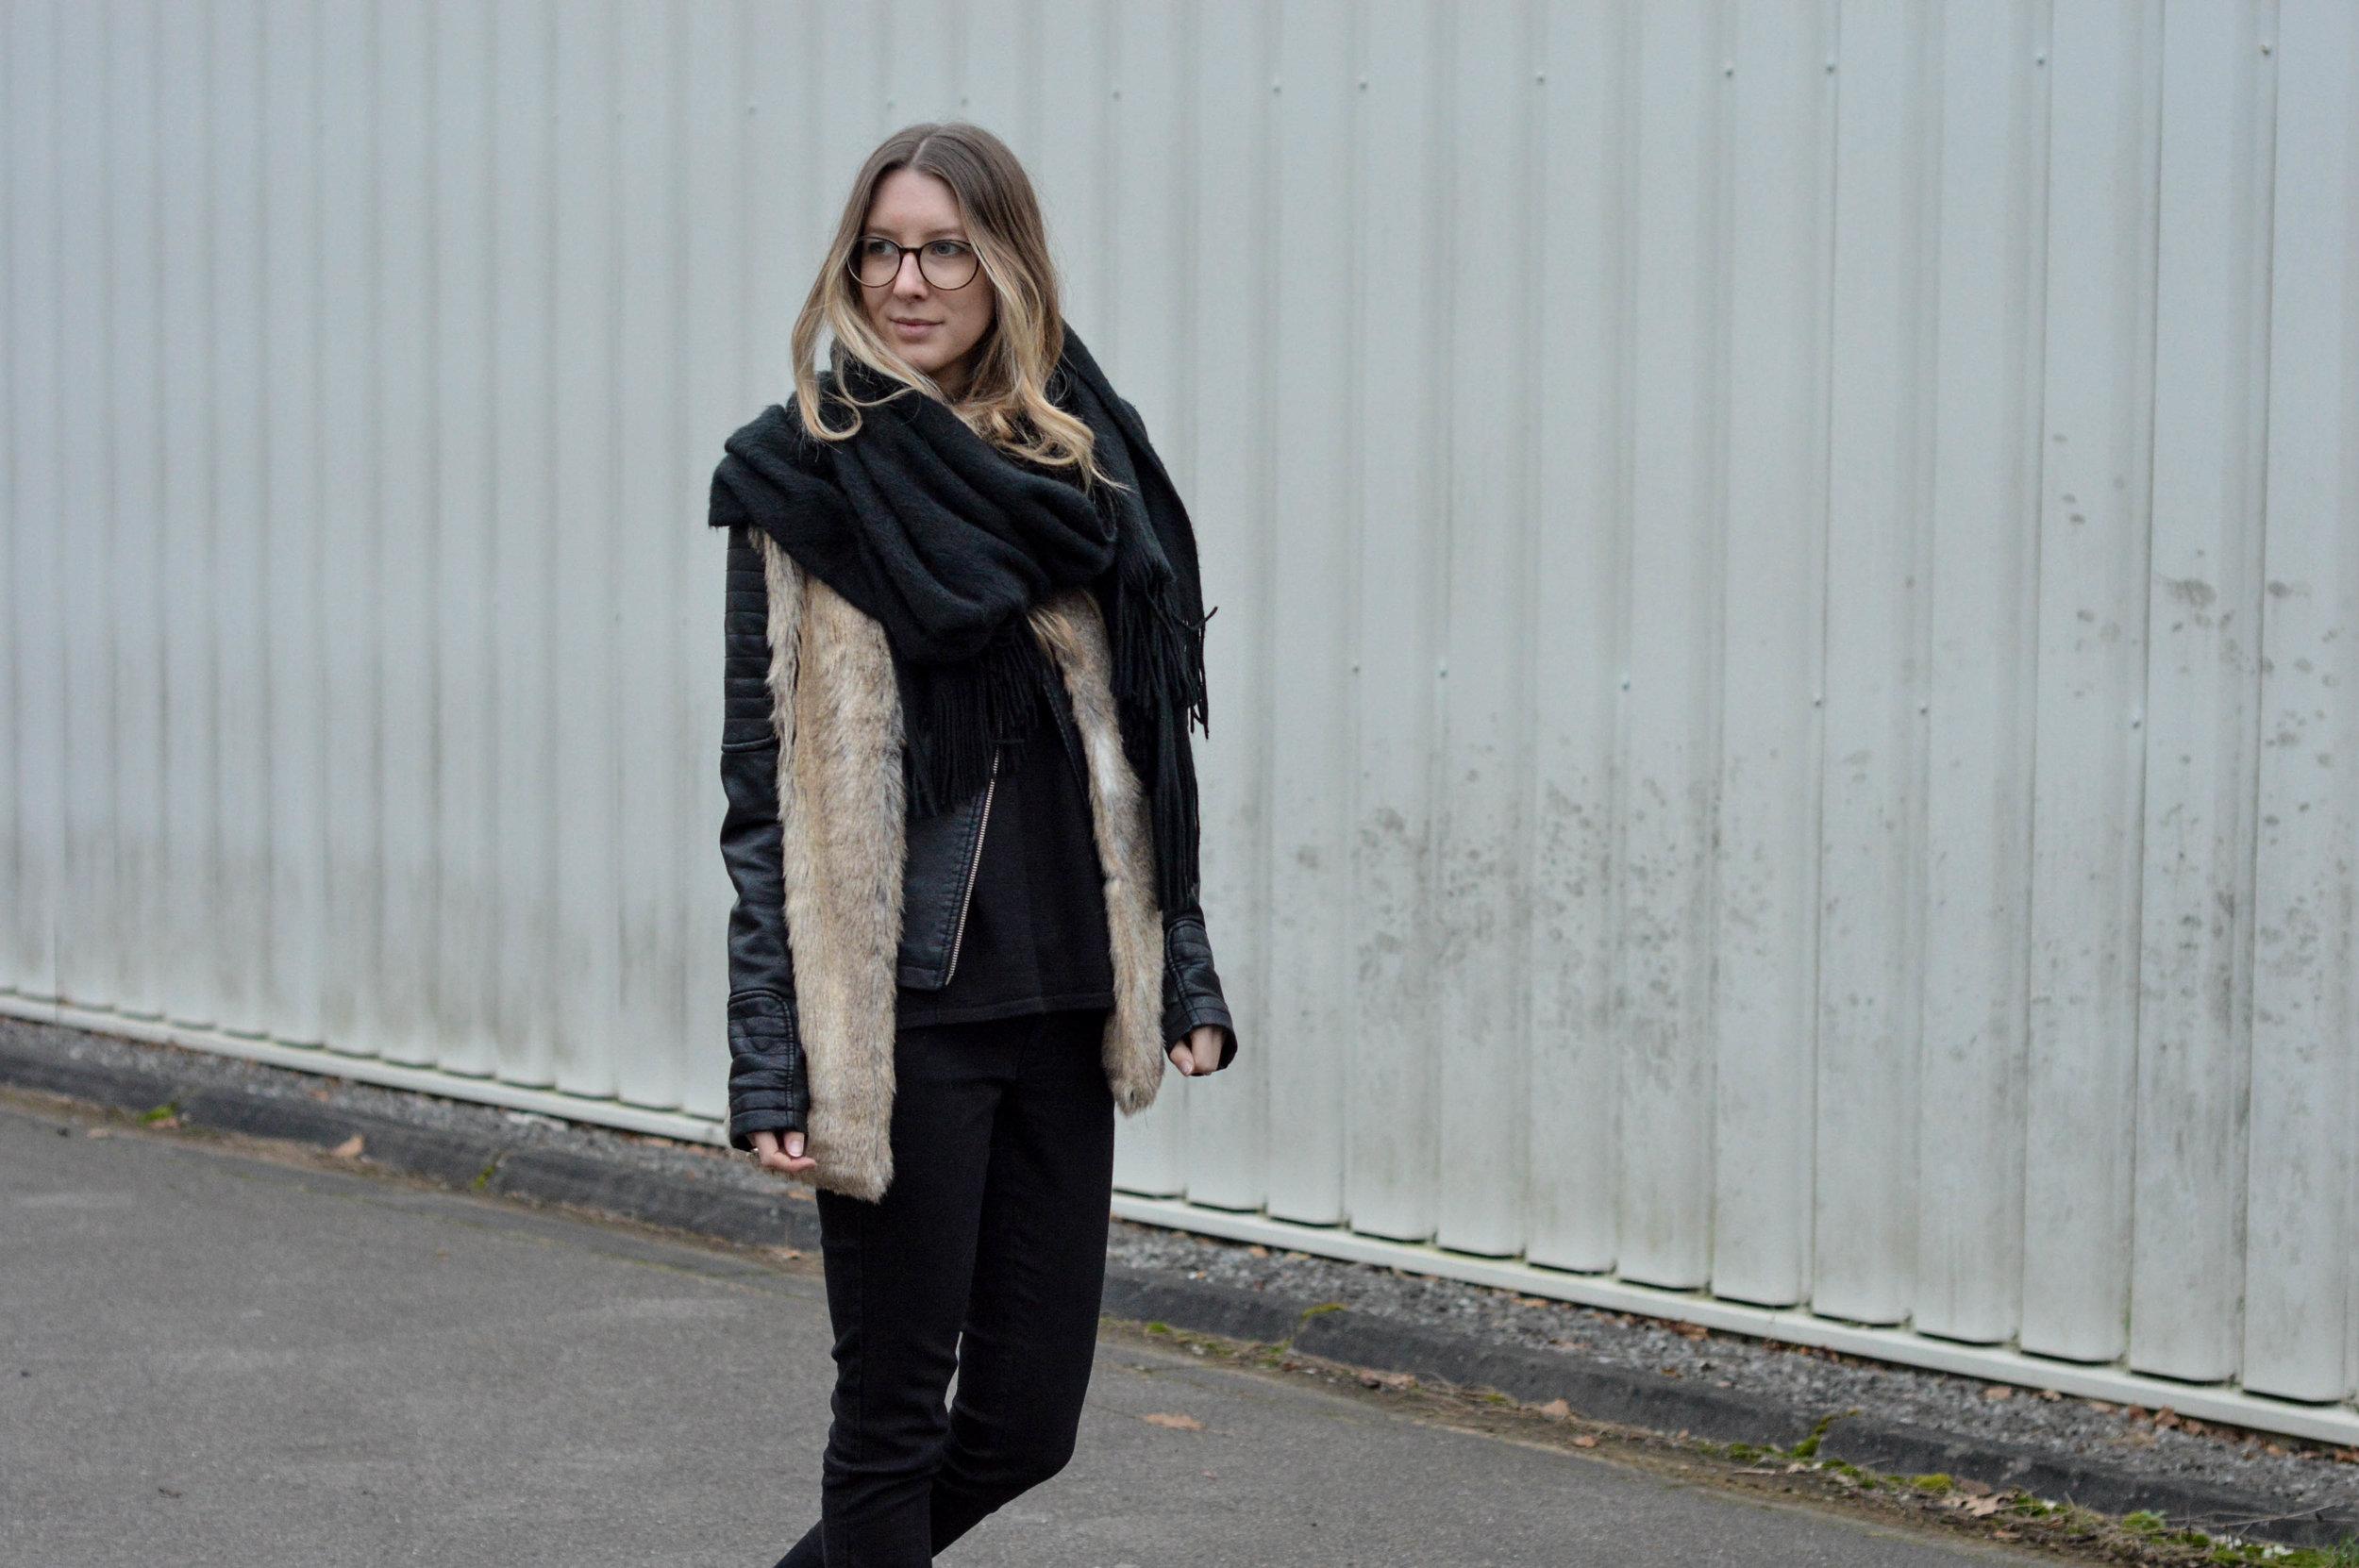 Faux Fur Jacket - OSIARAH.COM (14 of 17).jpg